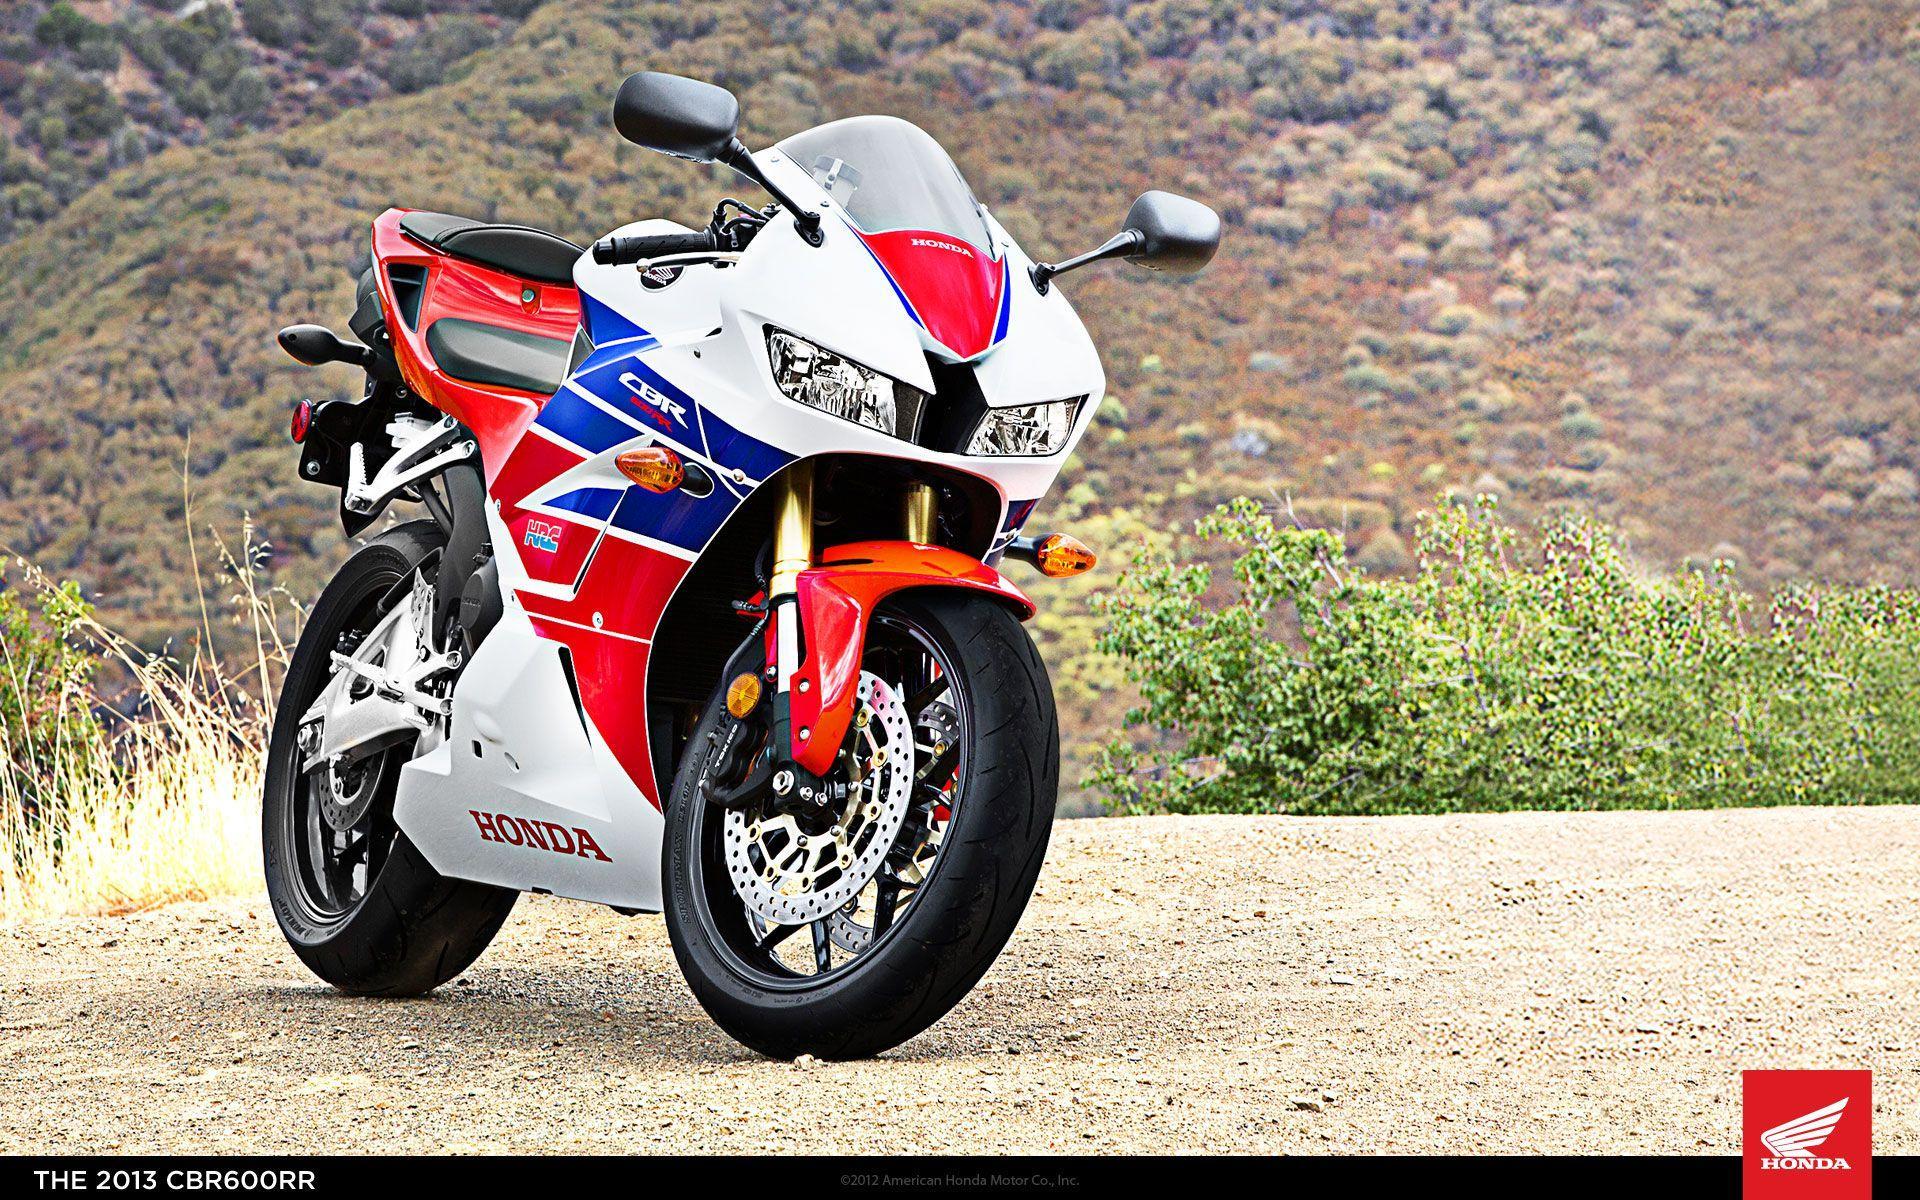 Honda CBR600RR Wallpapers - Wallpaper CaveHonda Superbike 2013 Wallpaper